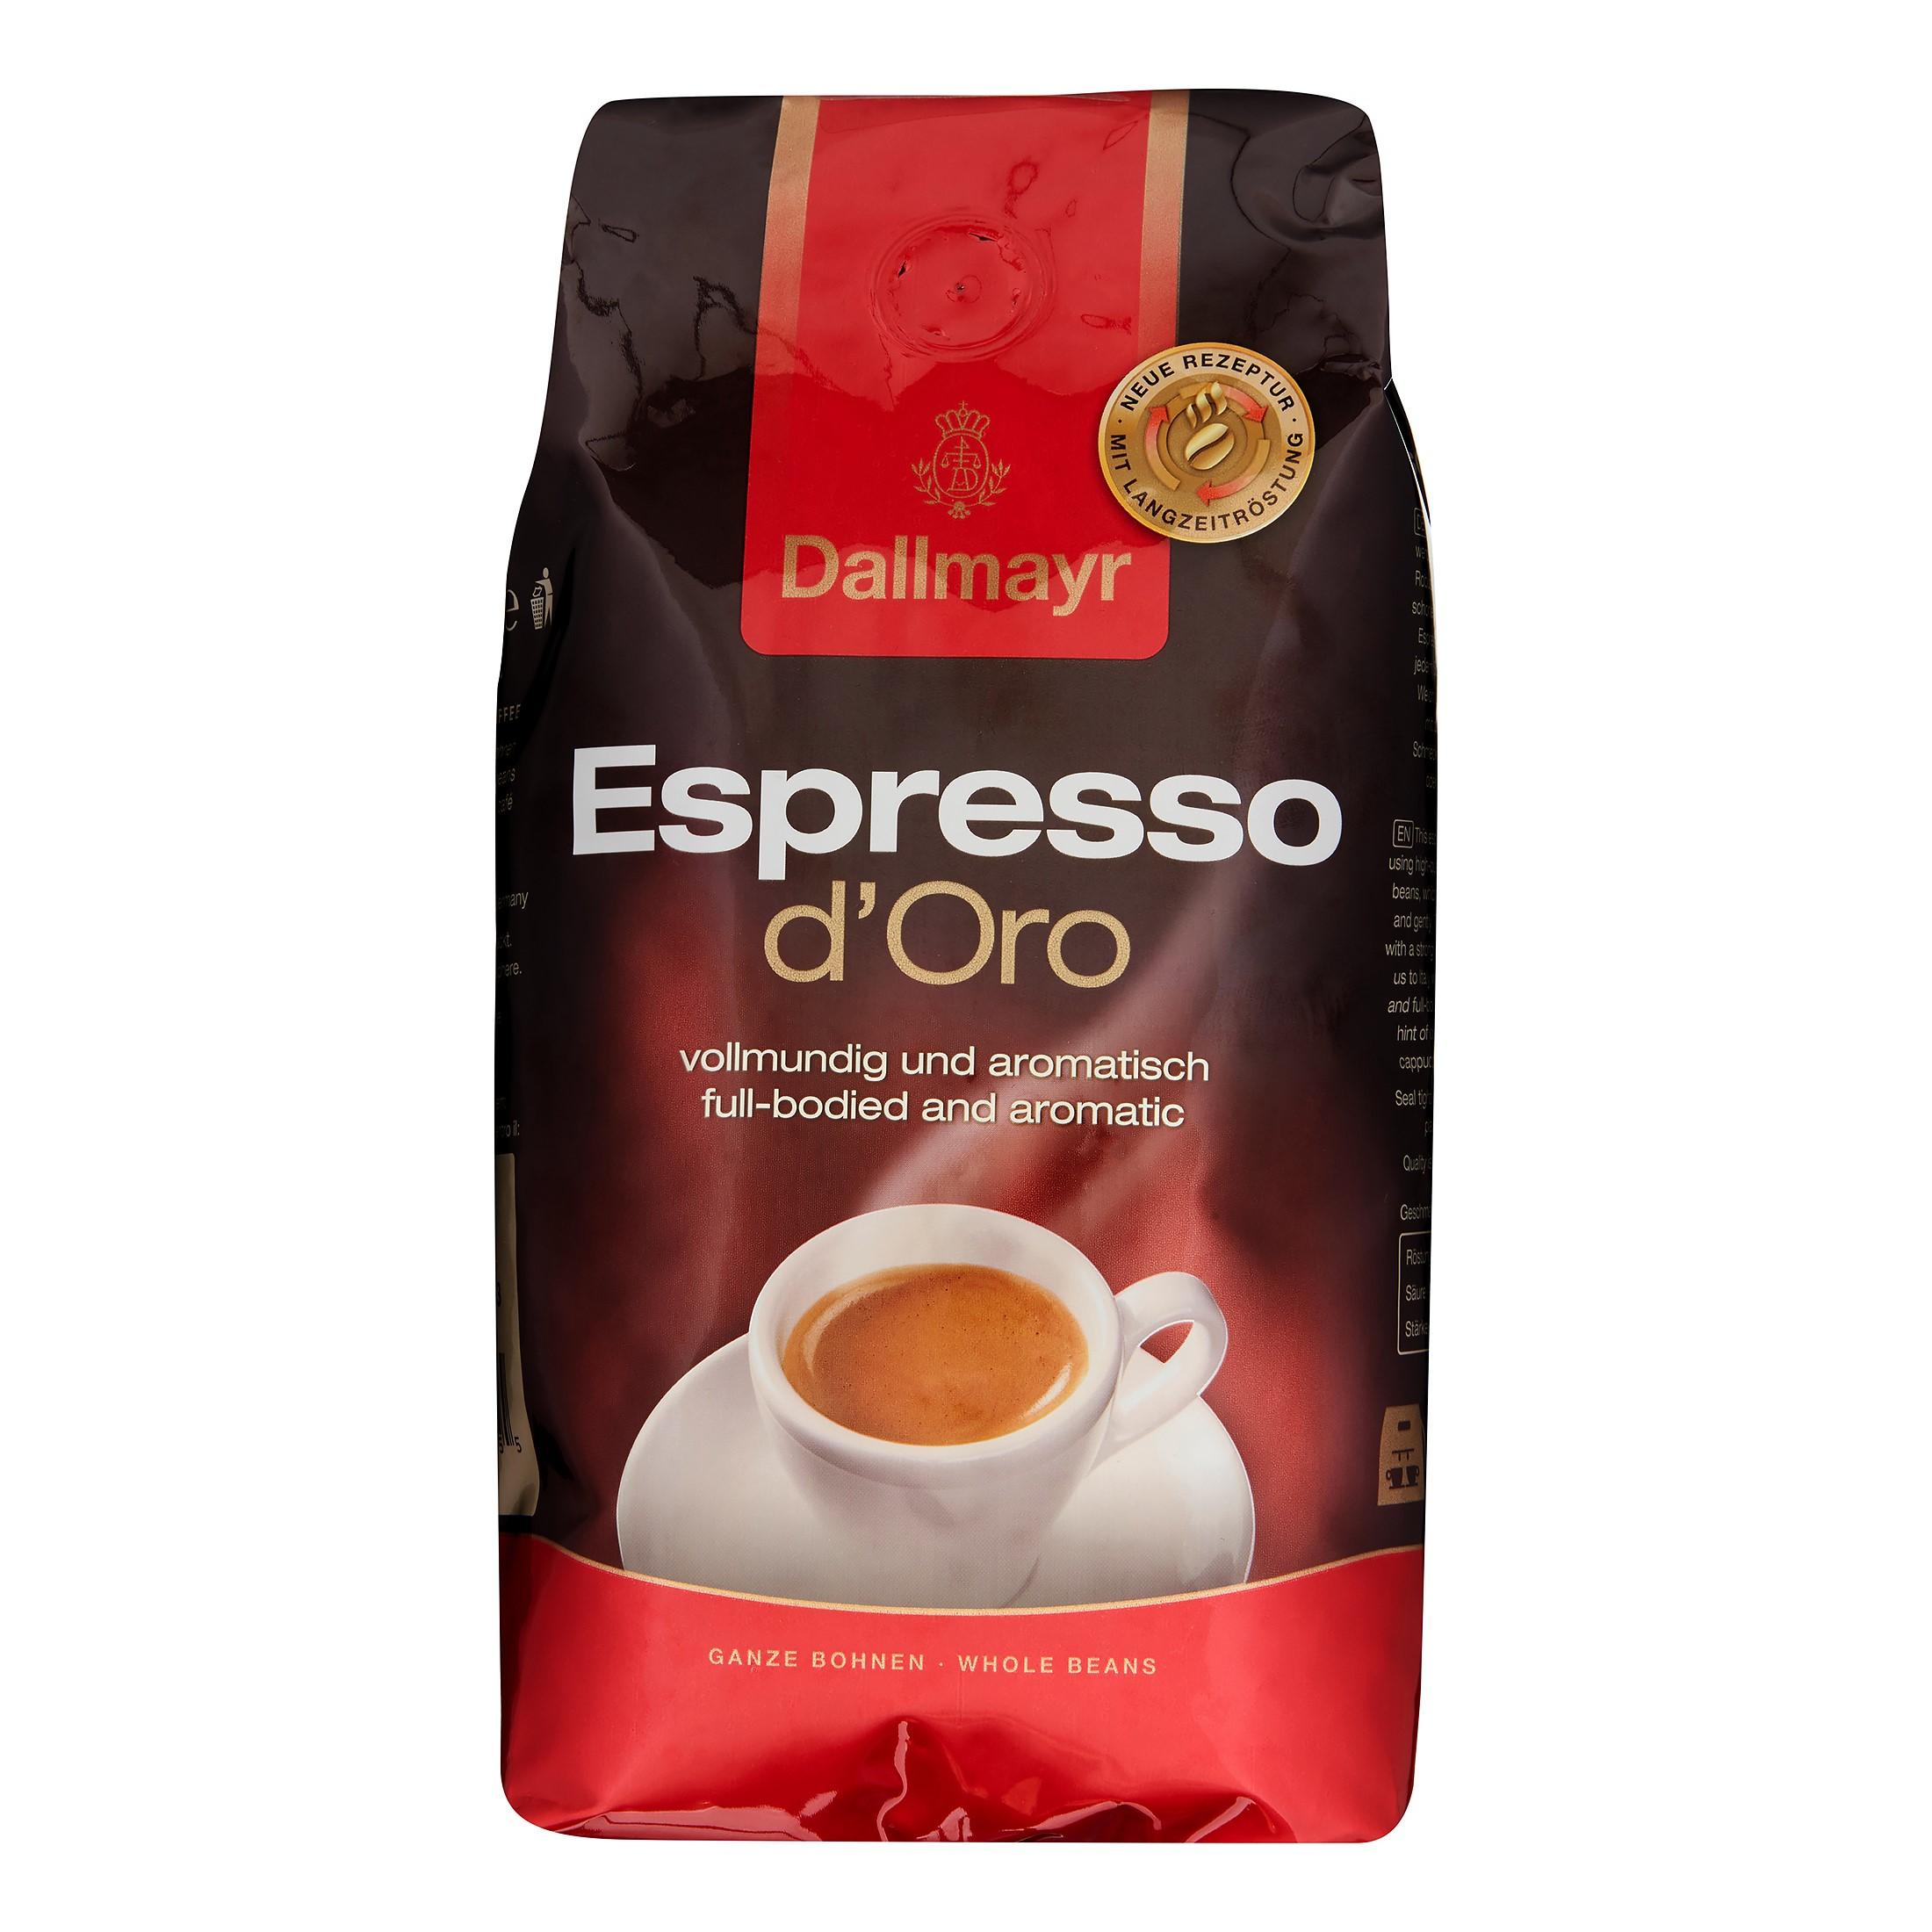 Dallmayr Espresso D'Oro Whole Bean Coffee, 17.6 Oz